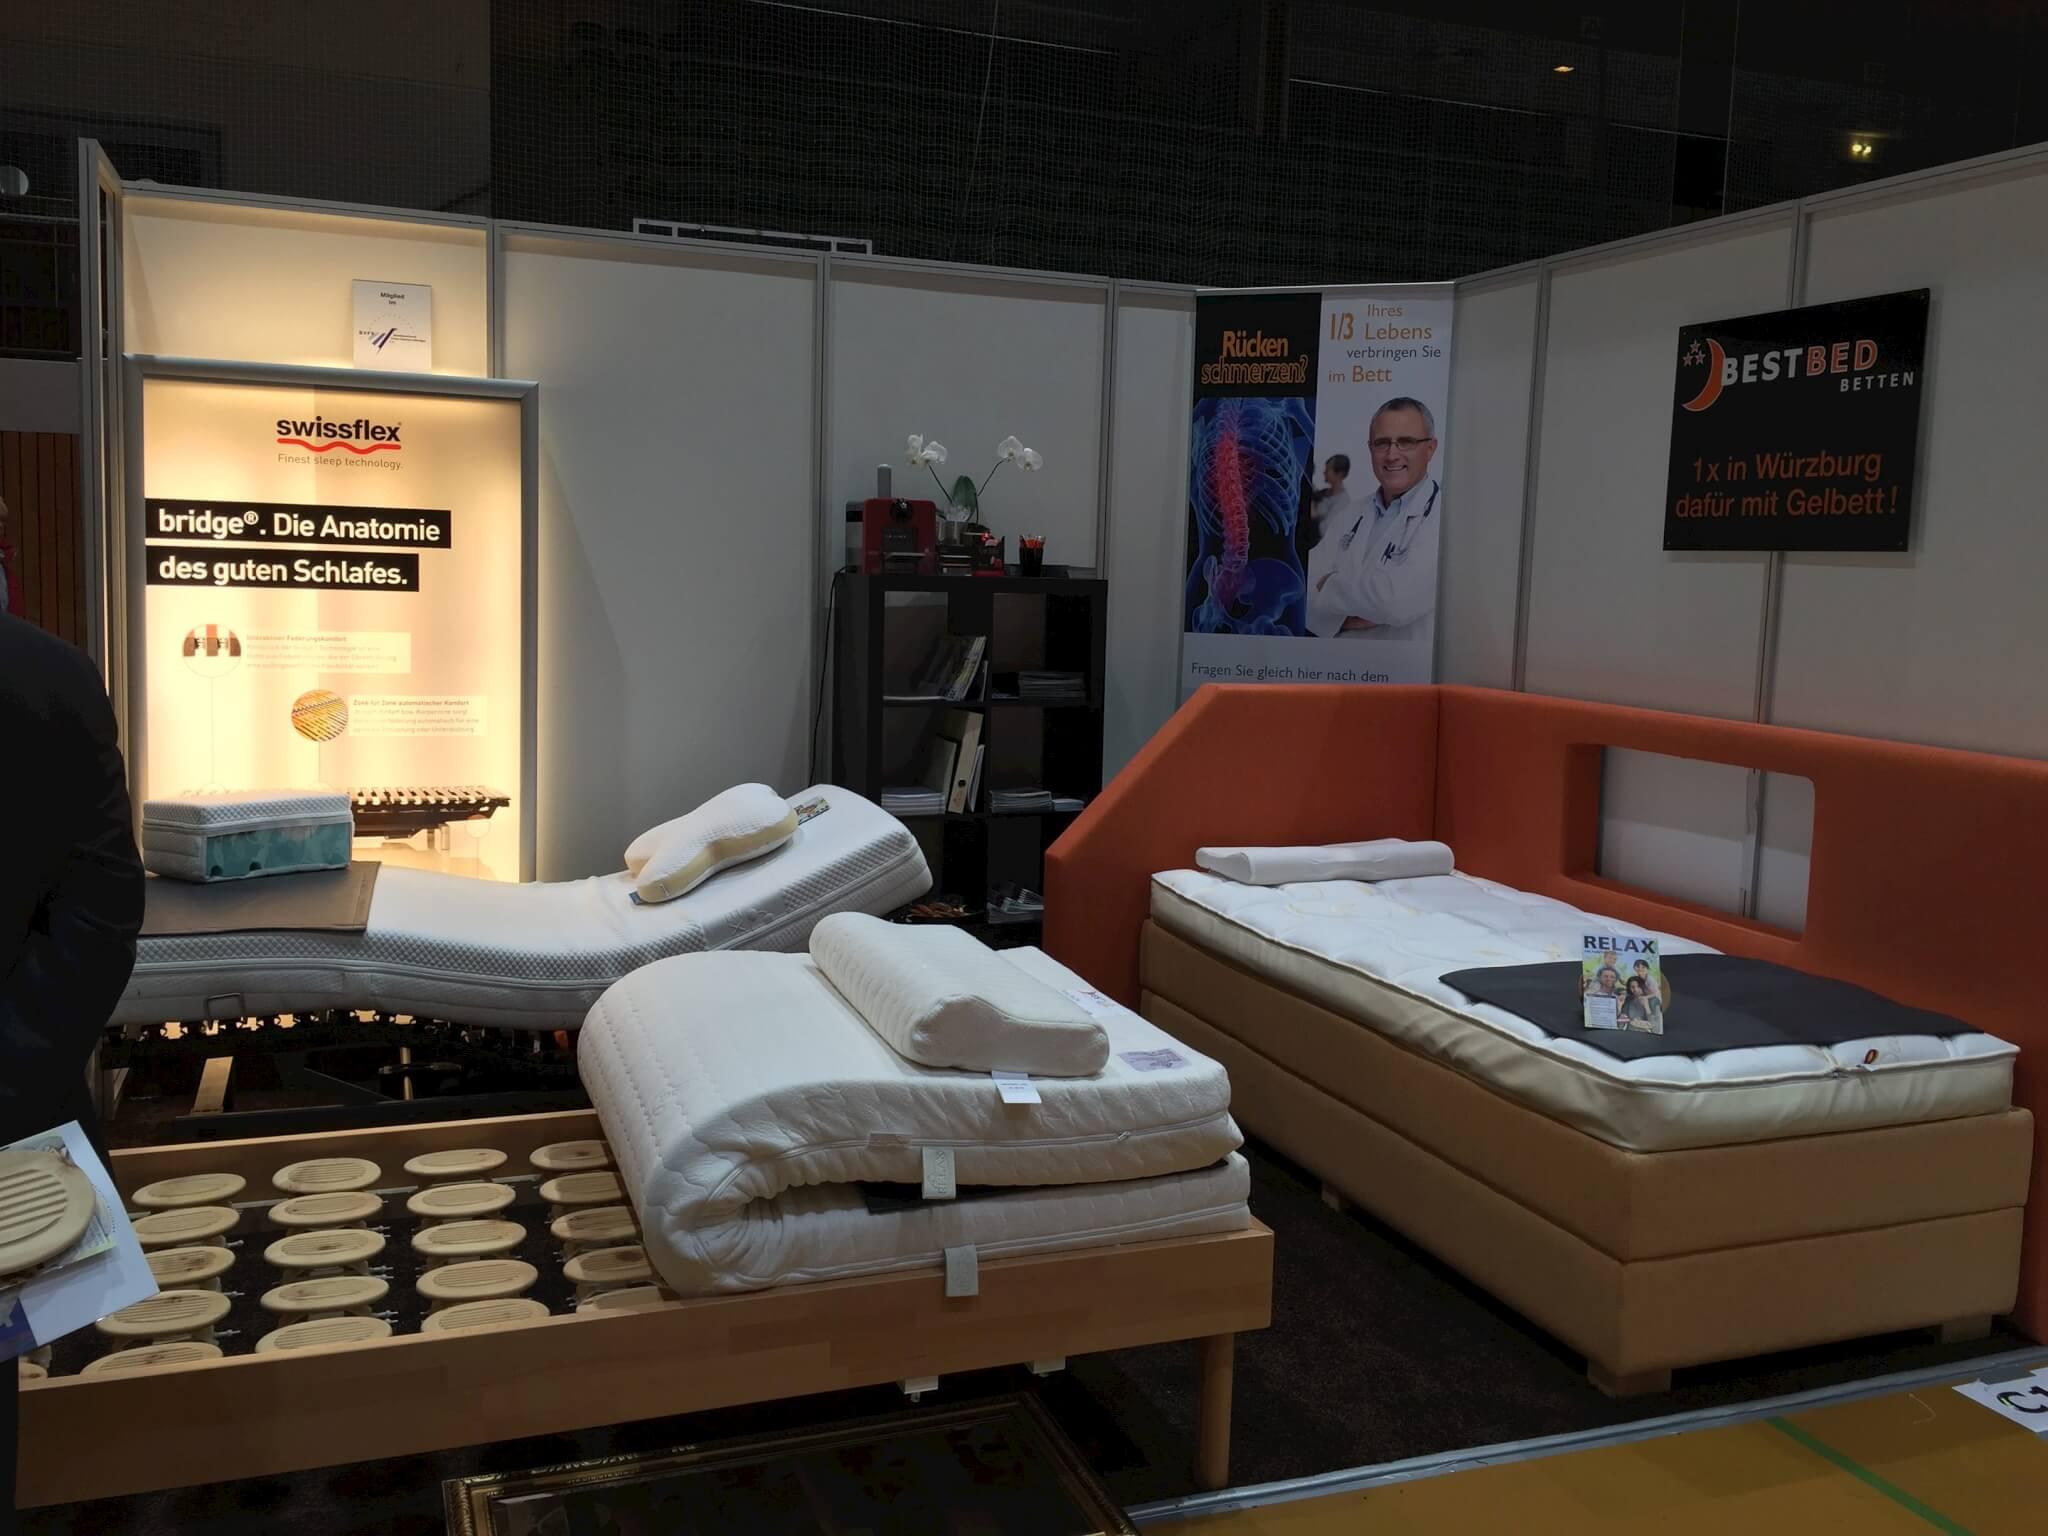 gesund vital messe in w rzburg 2015 bestbed. Black Bedroom Furniture Sets. Home Design Ideas